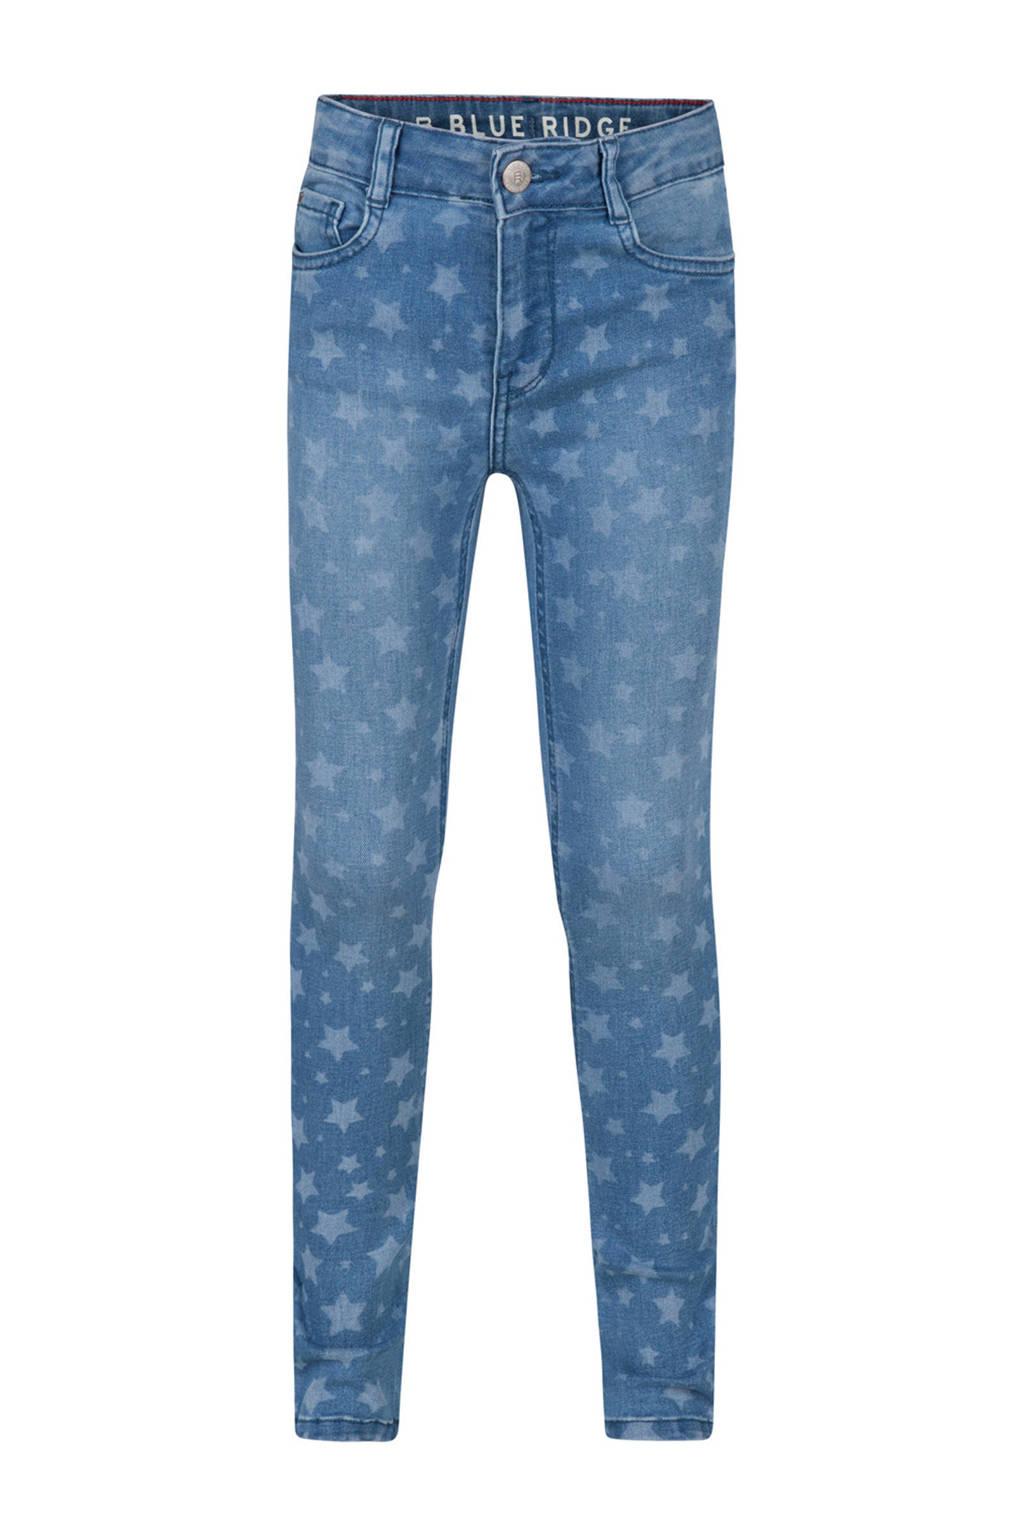 WE Fashion Blue Ridge skinny jeans blauw met sterrenprint, Blue denim